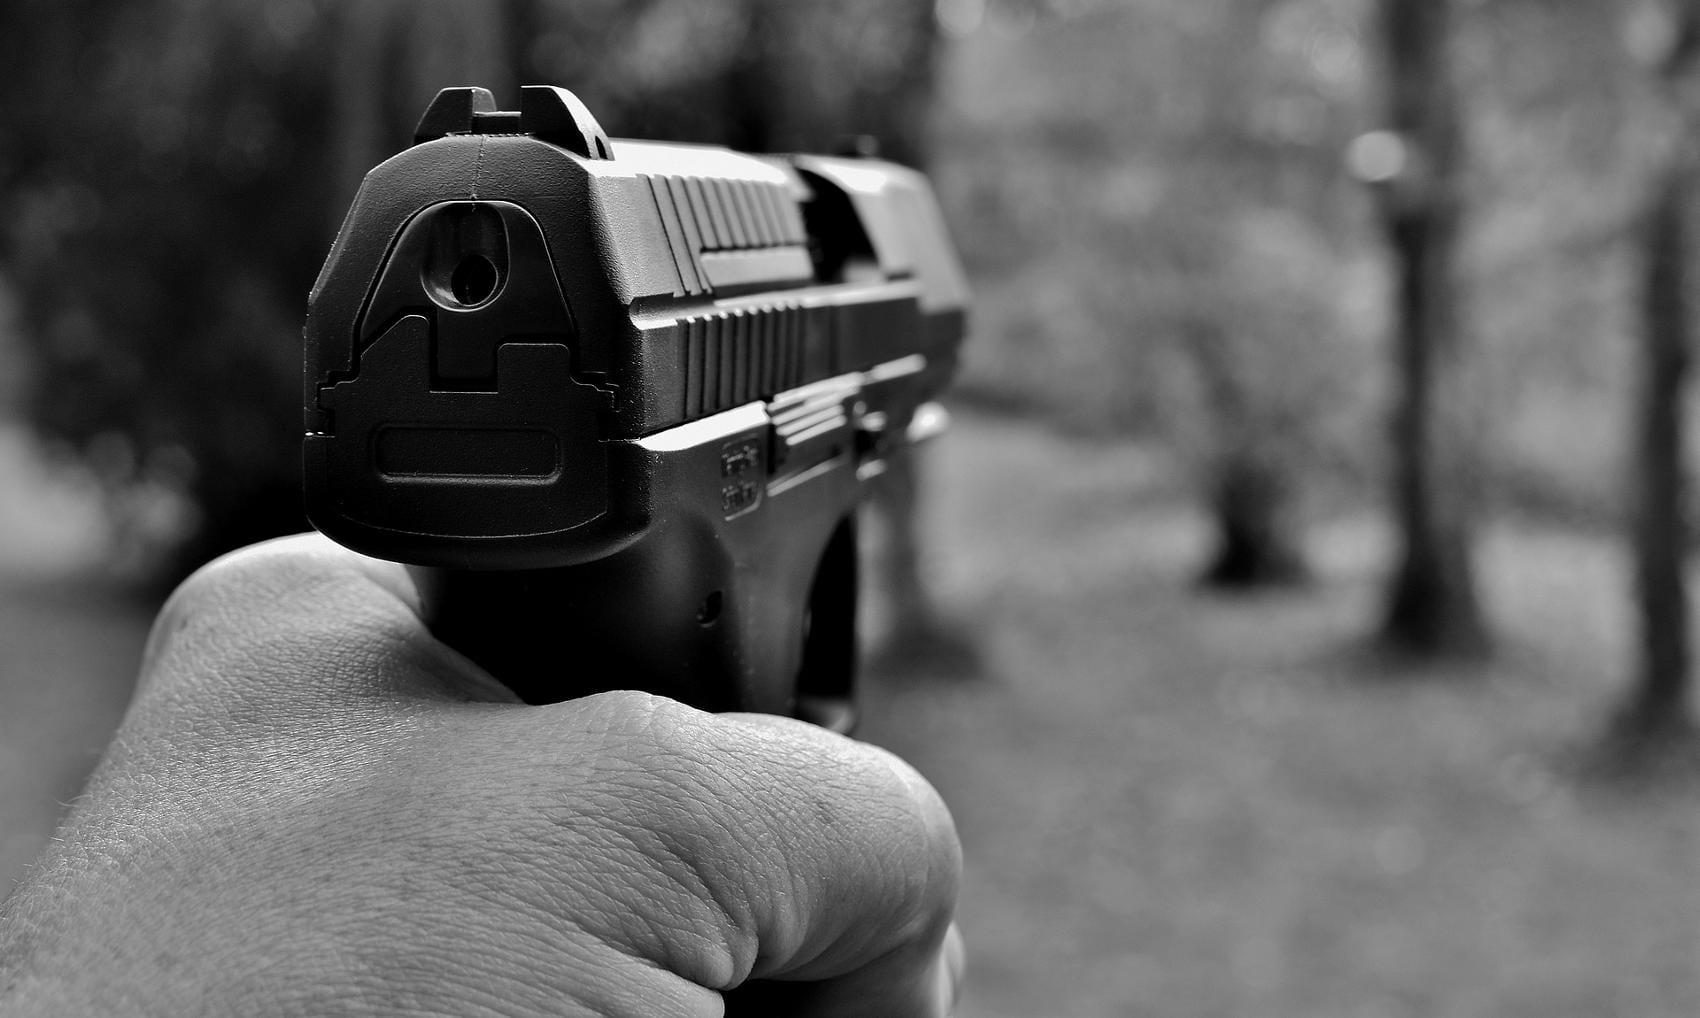 Pistole Waffe Hand